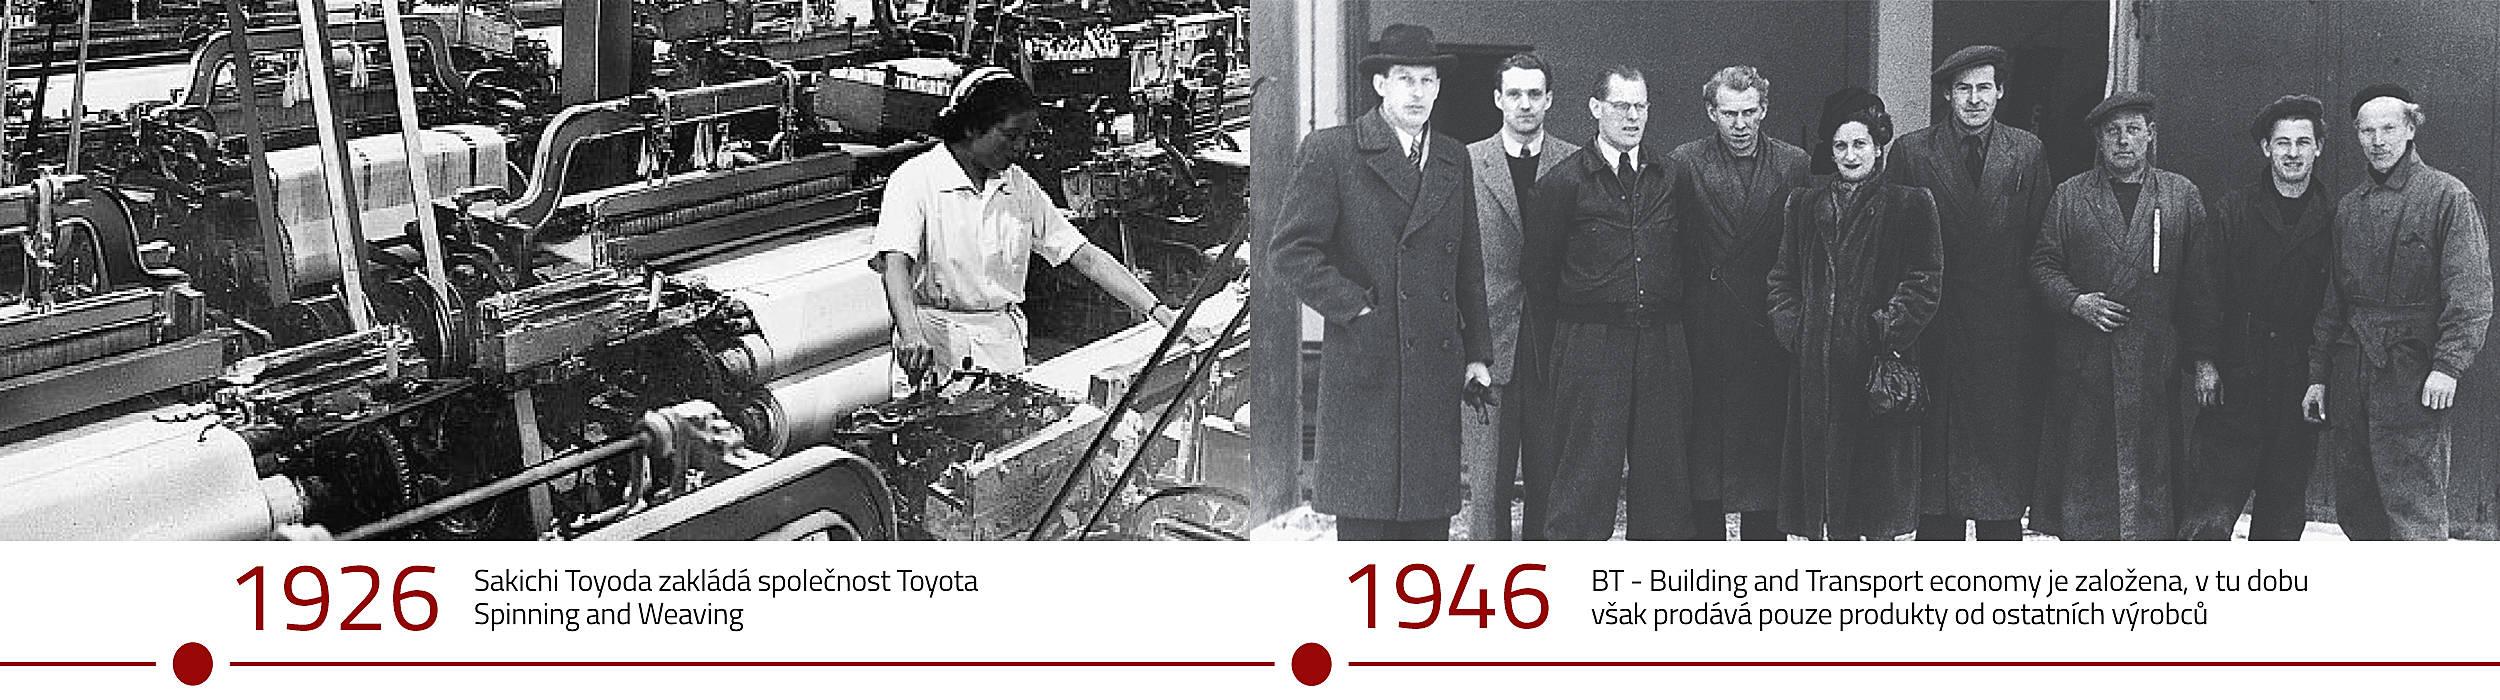 Historie Toyota Material Handling